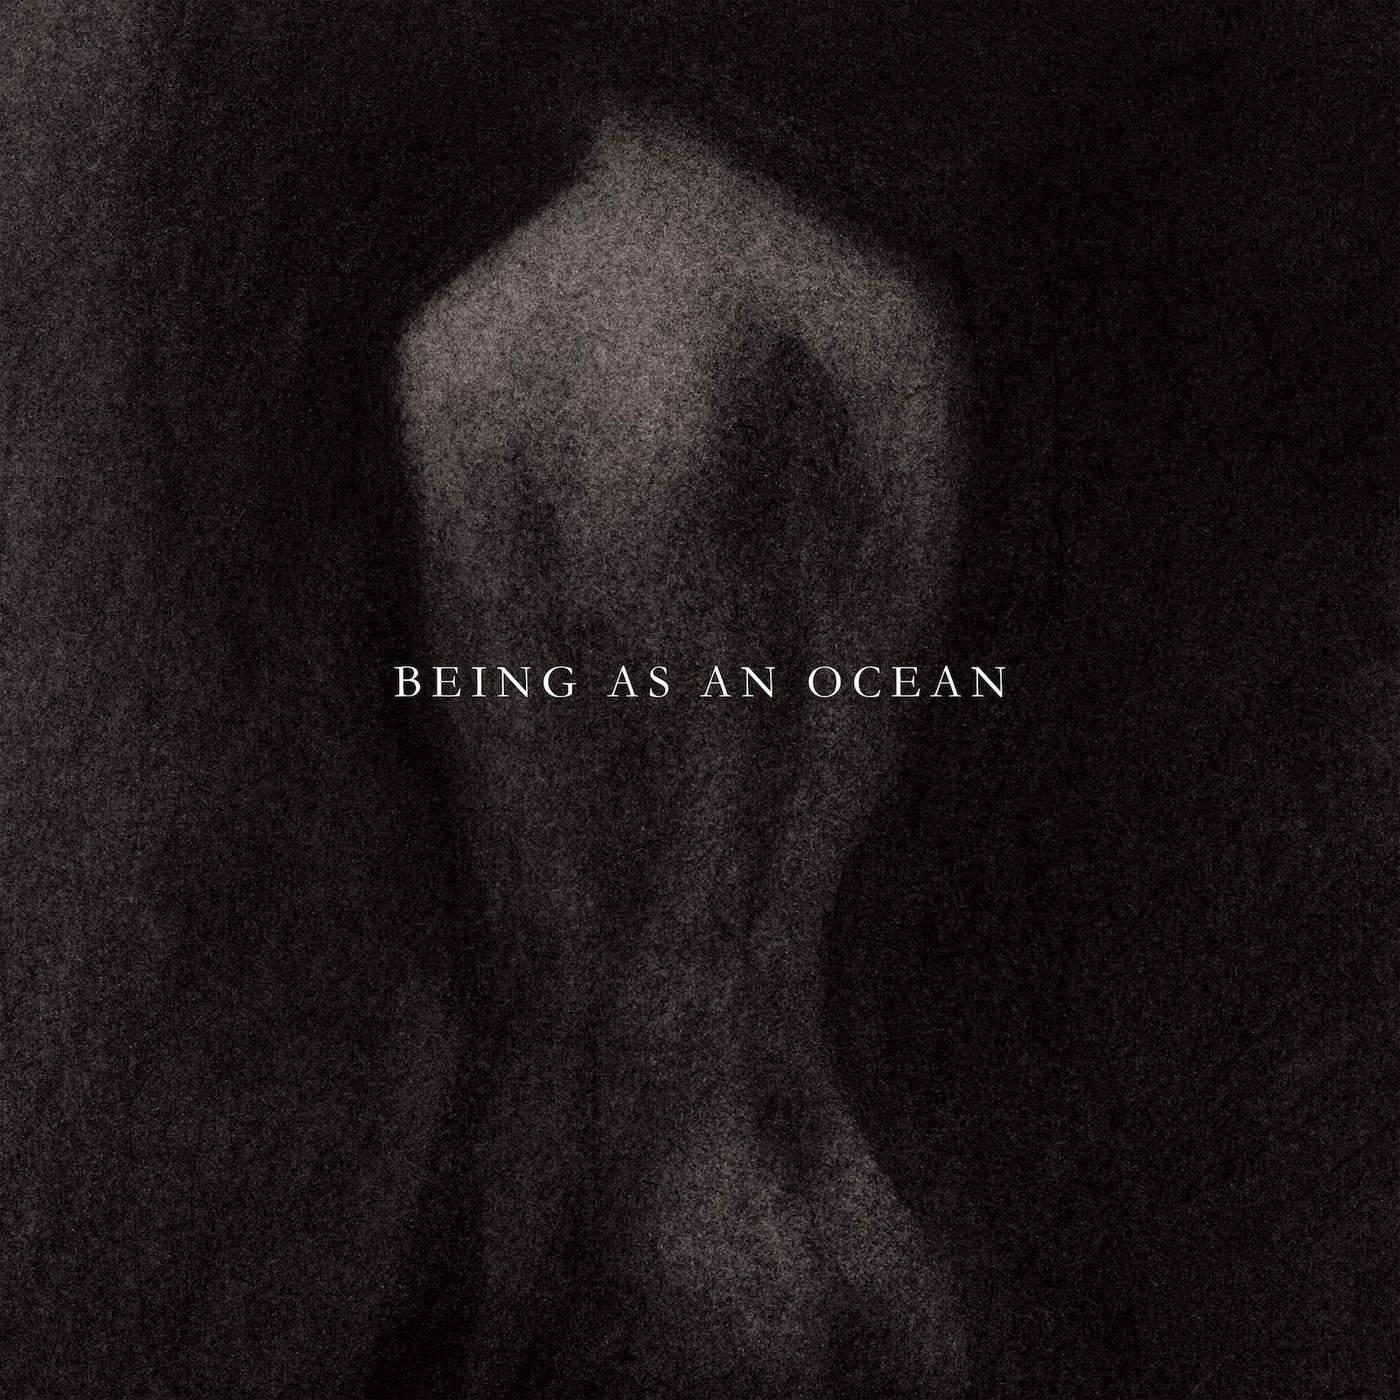 Being As An Ocean - Being As An Ocean (2015)